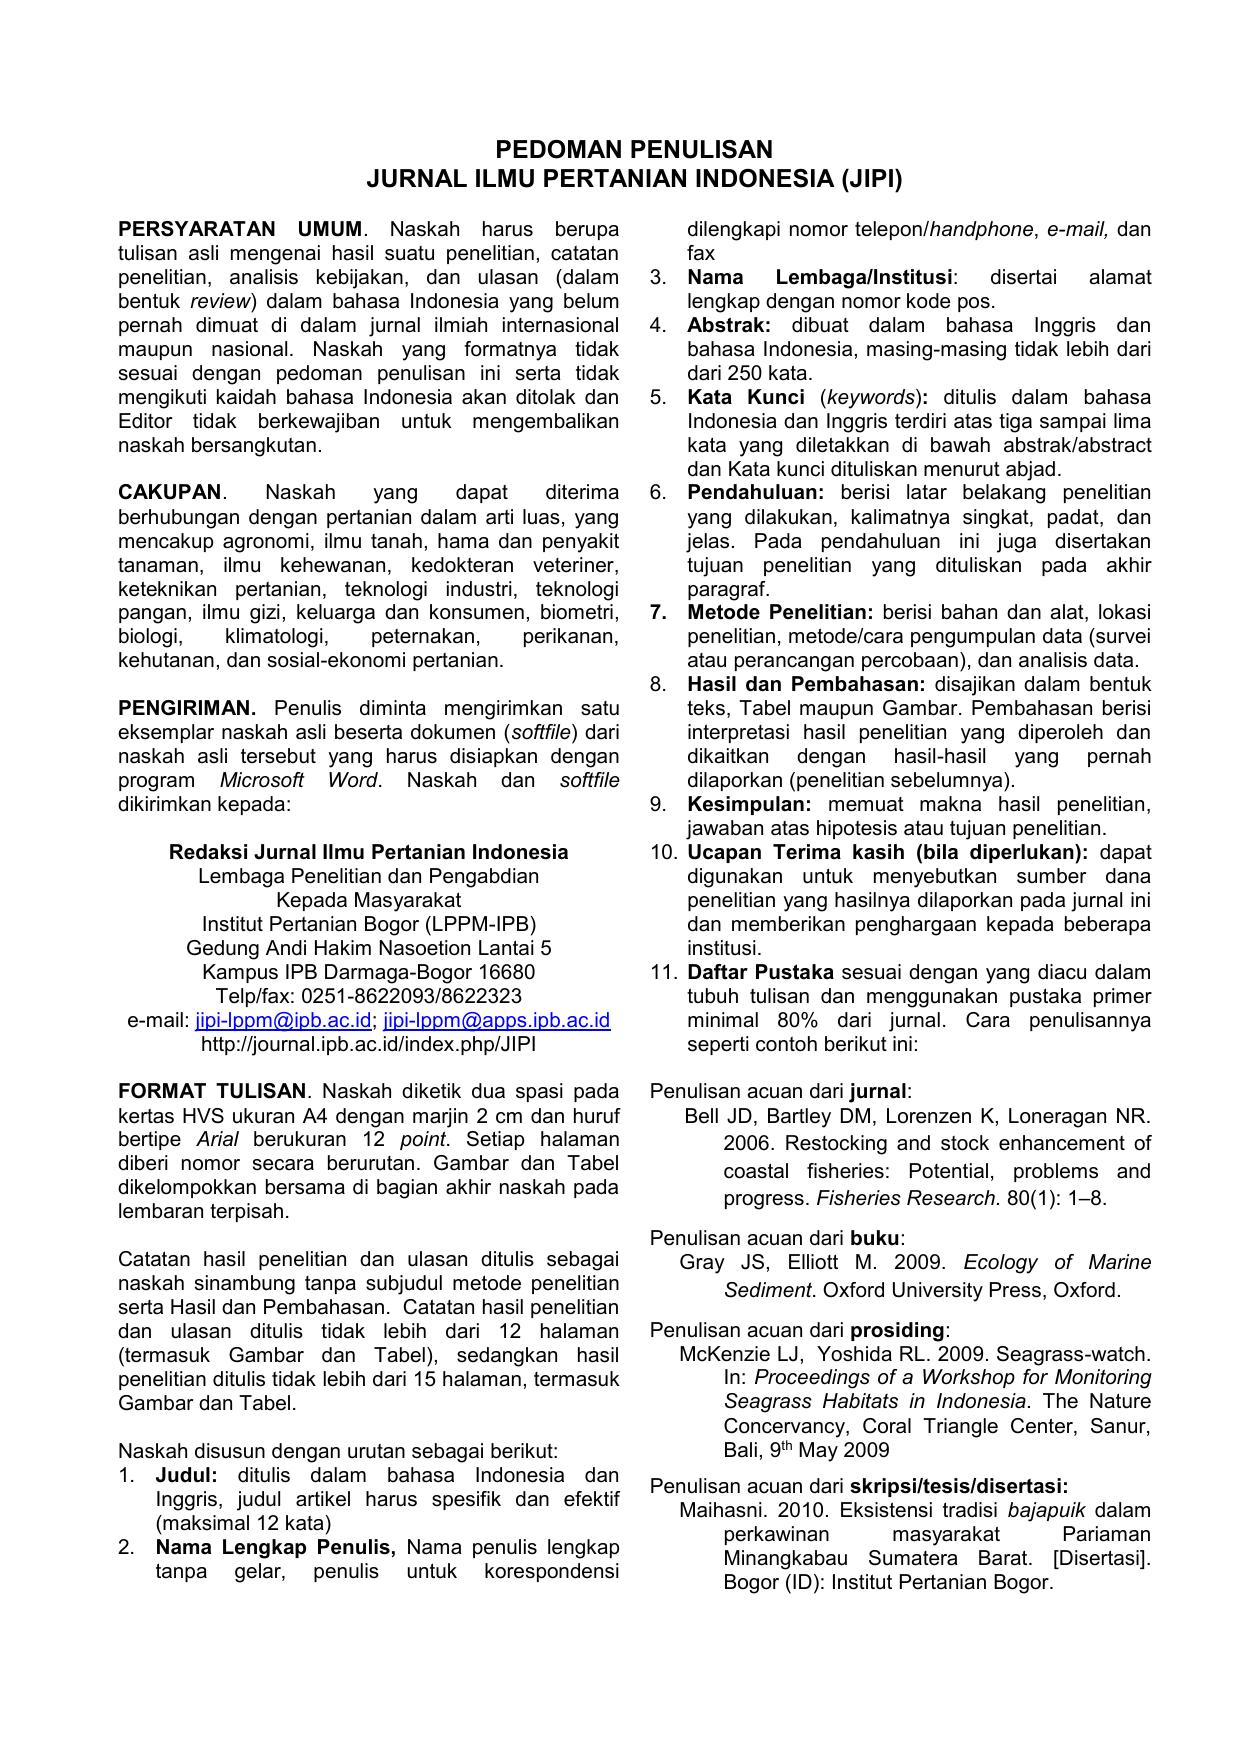 Pedoman Penulisan Jurnal Ilmu Pertanian Indonesia Jipi